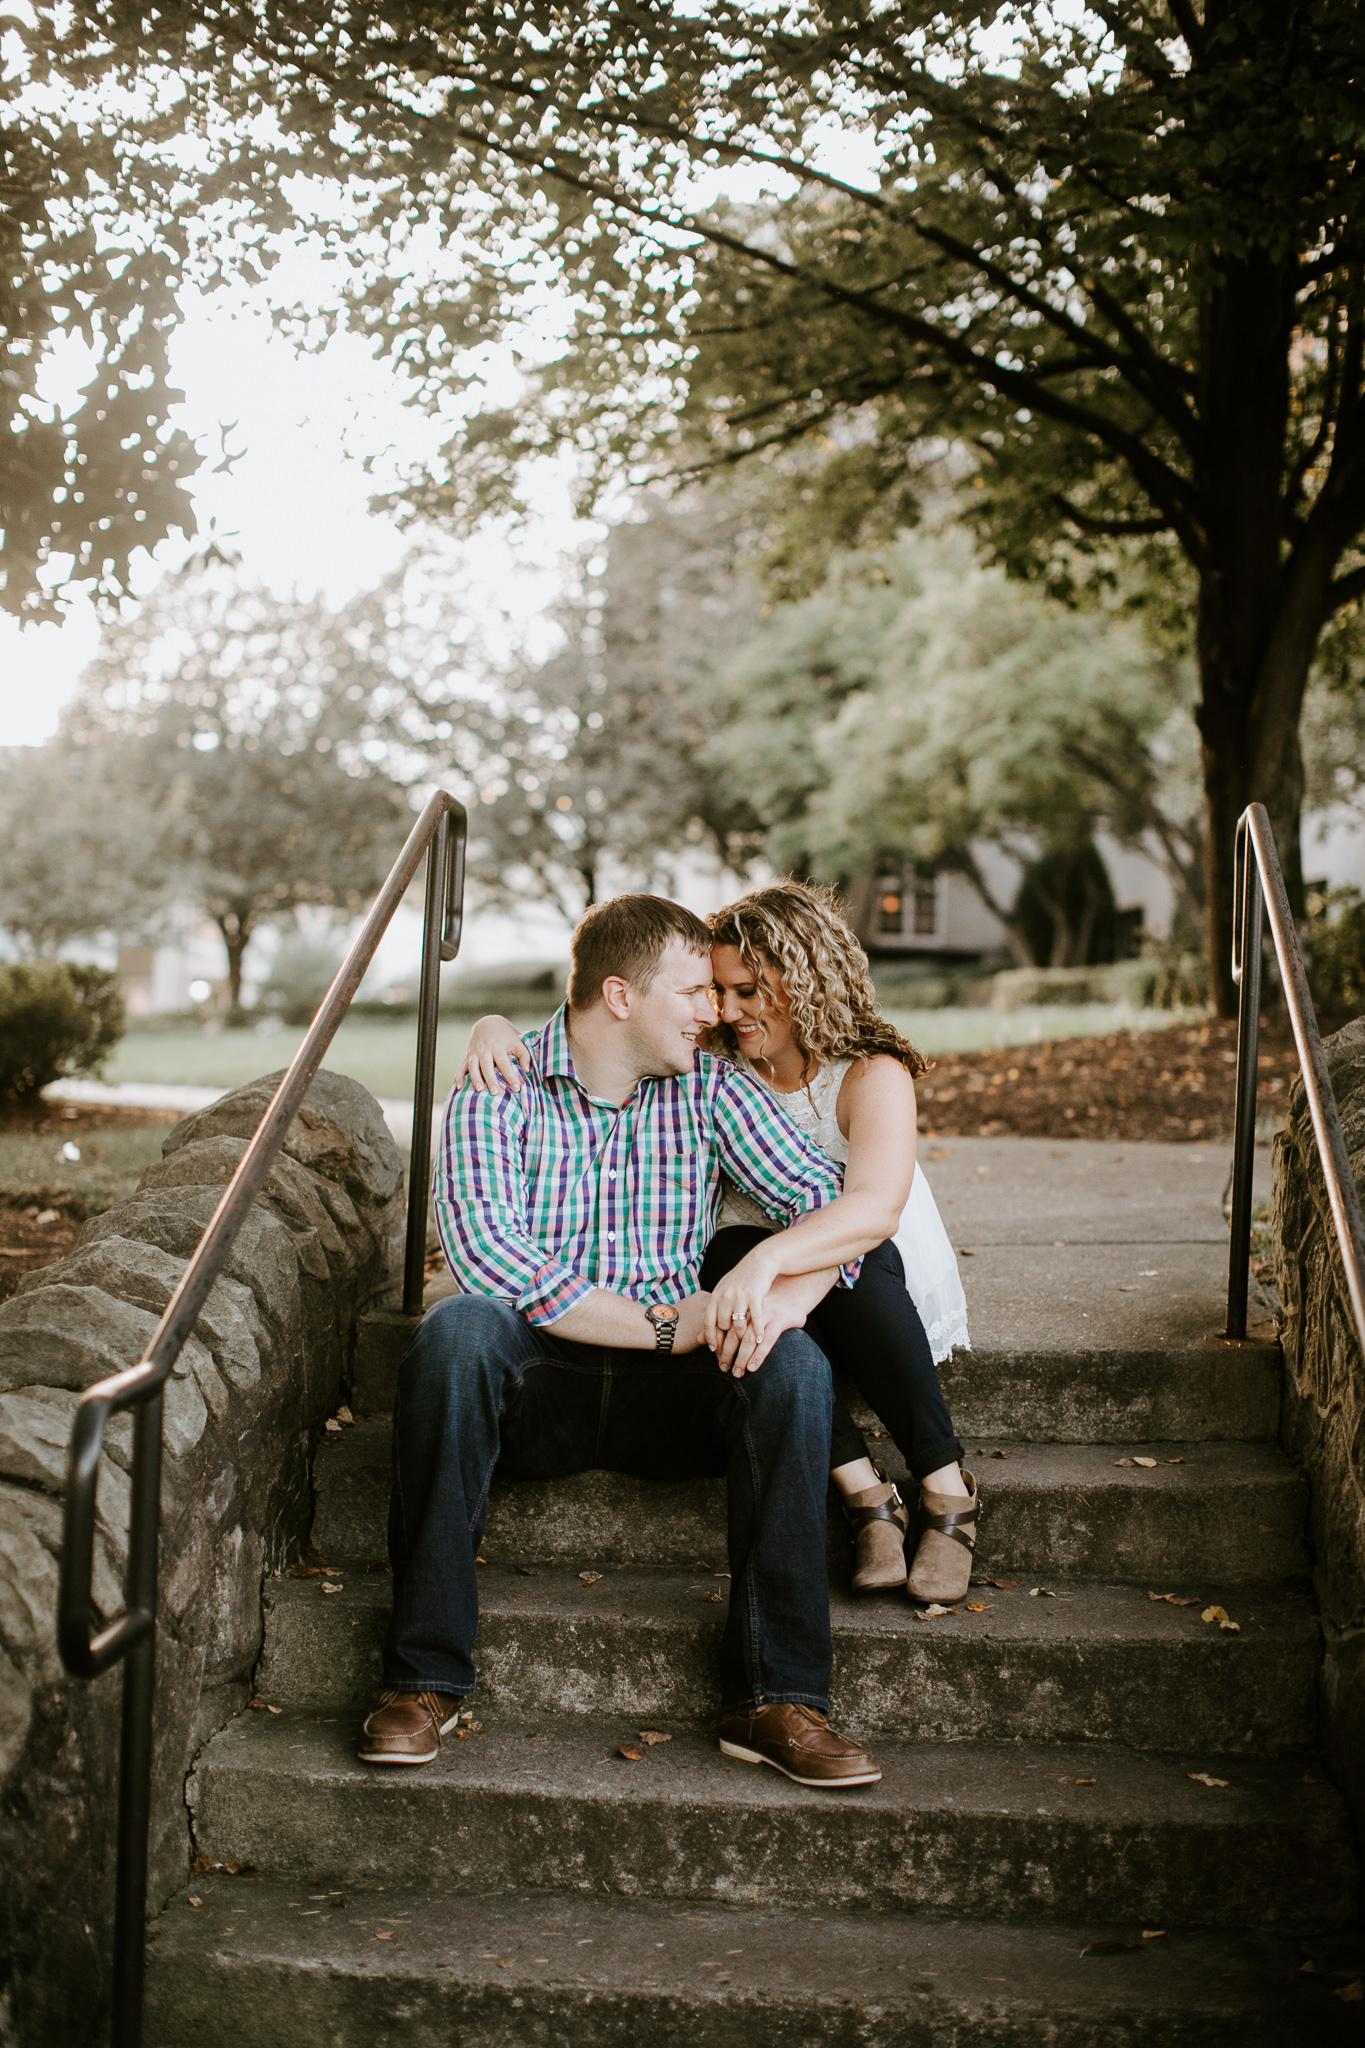 Roanoke - Engagement- Virginia wedding photographer - Pat Cori Photography-21.jpg